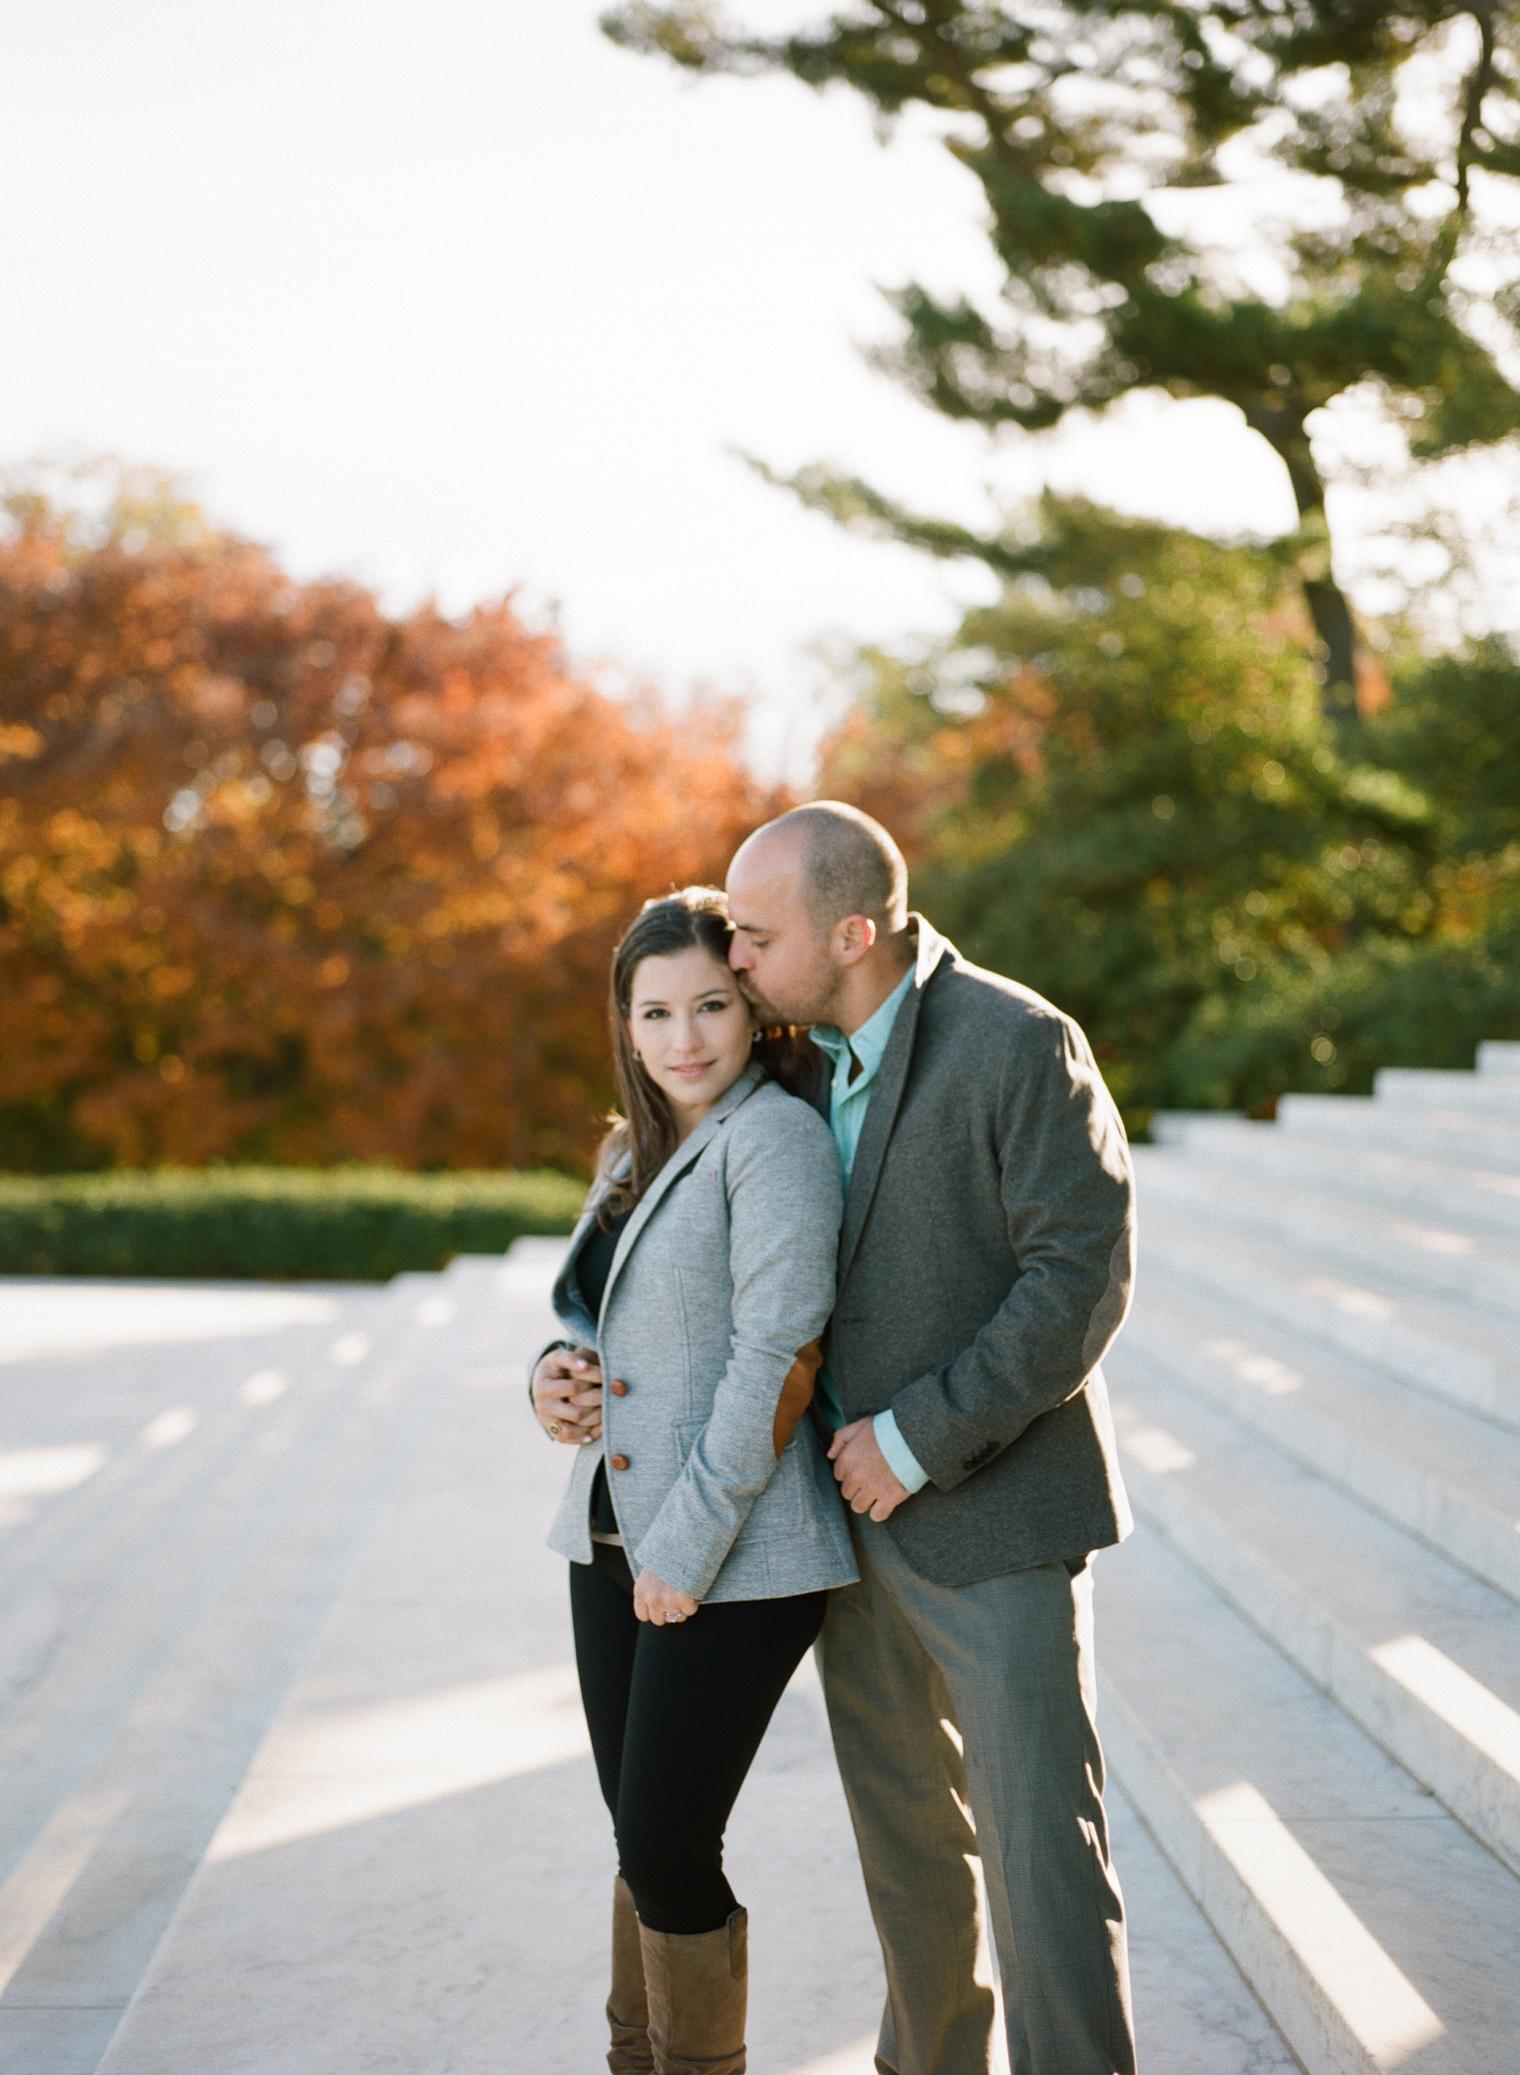 Jefferson-Memorial-Engagement-Photography010.jpg